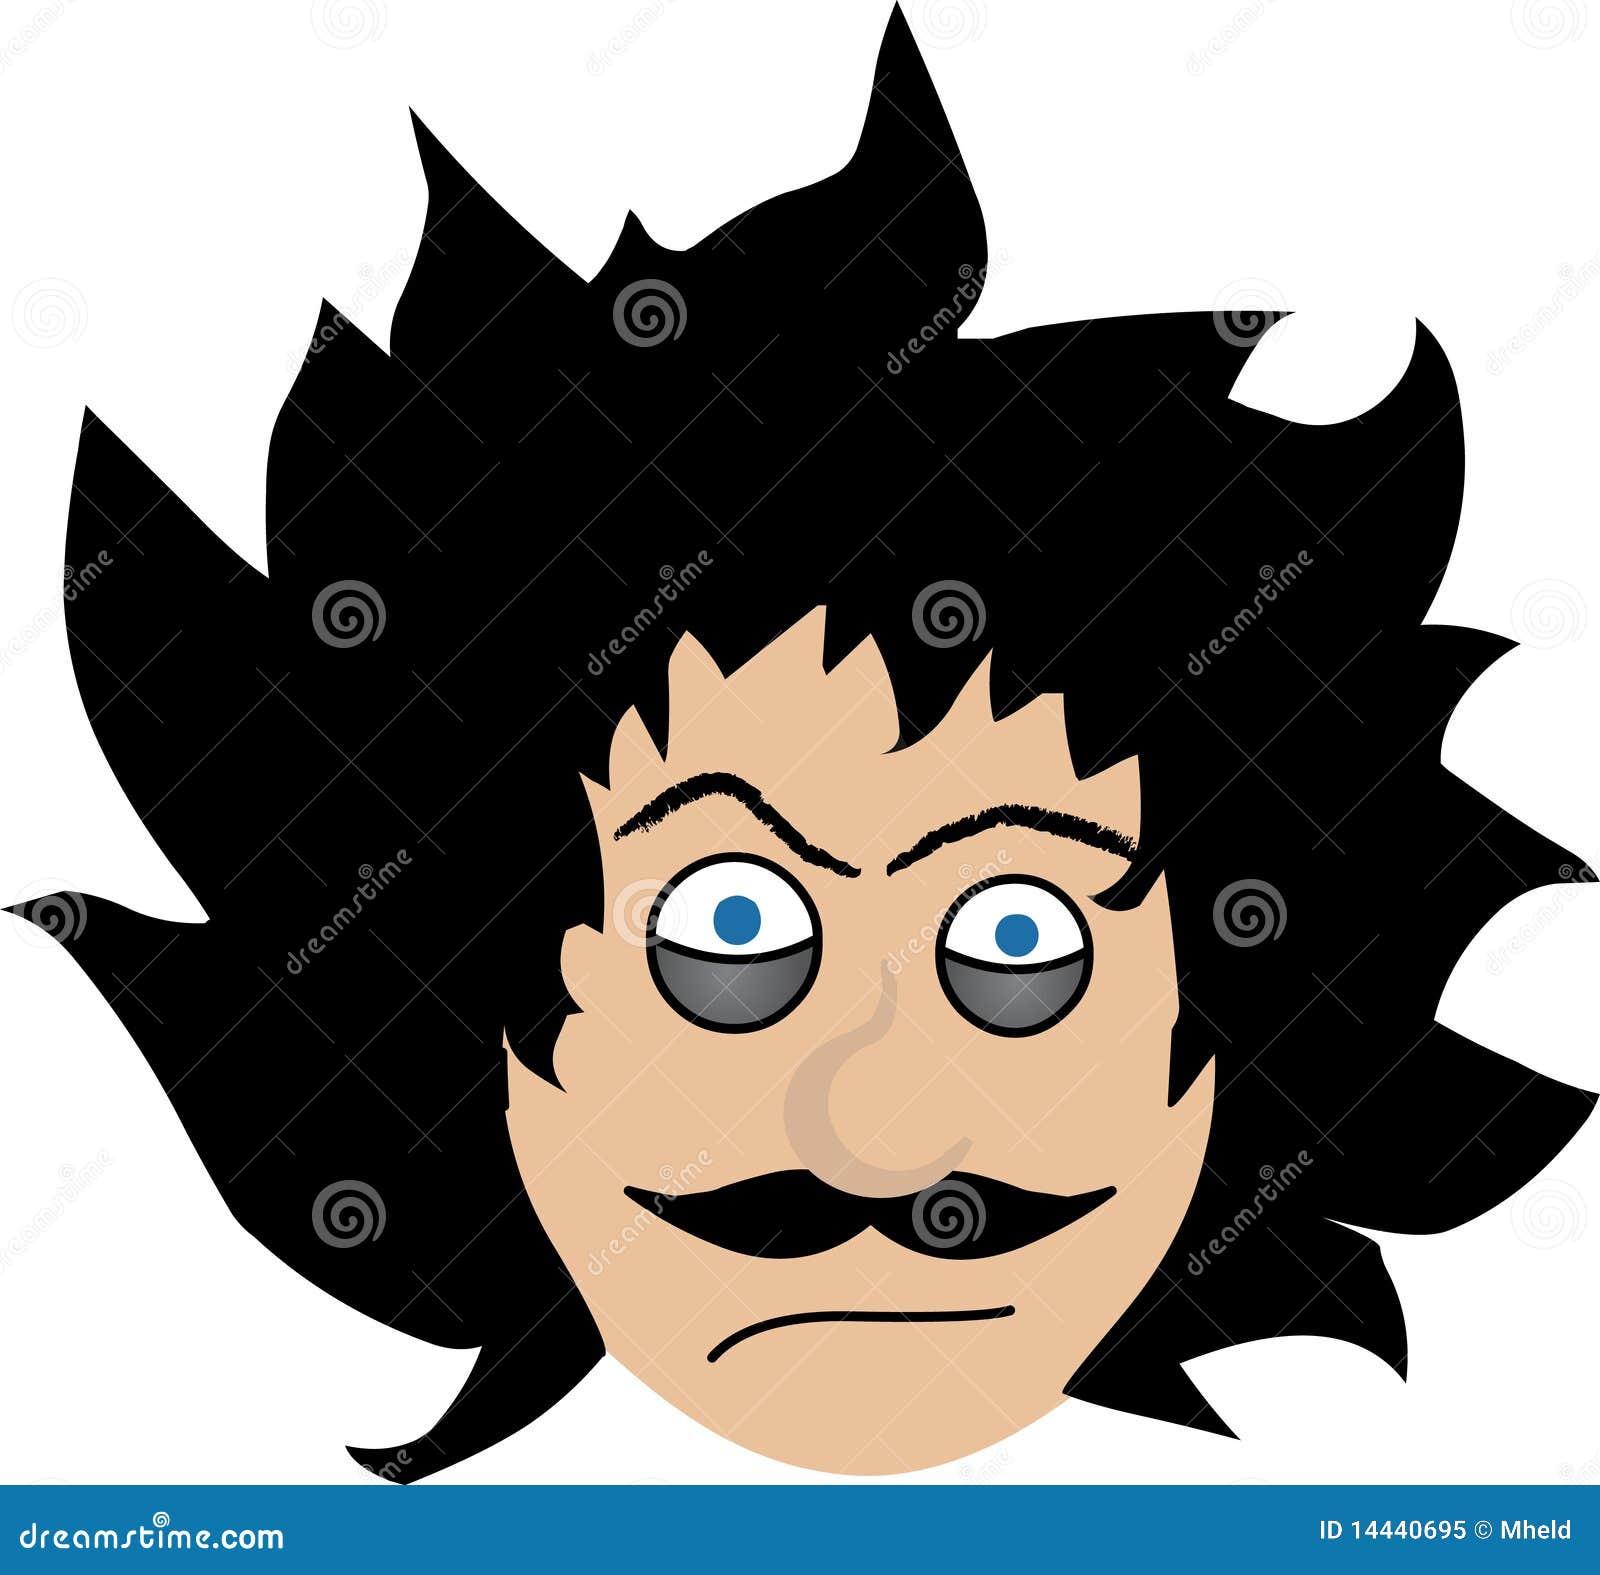 Depressed odd guy with big messy hair cartoon